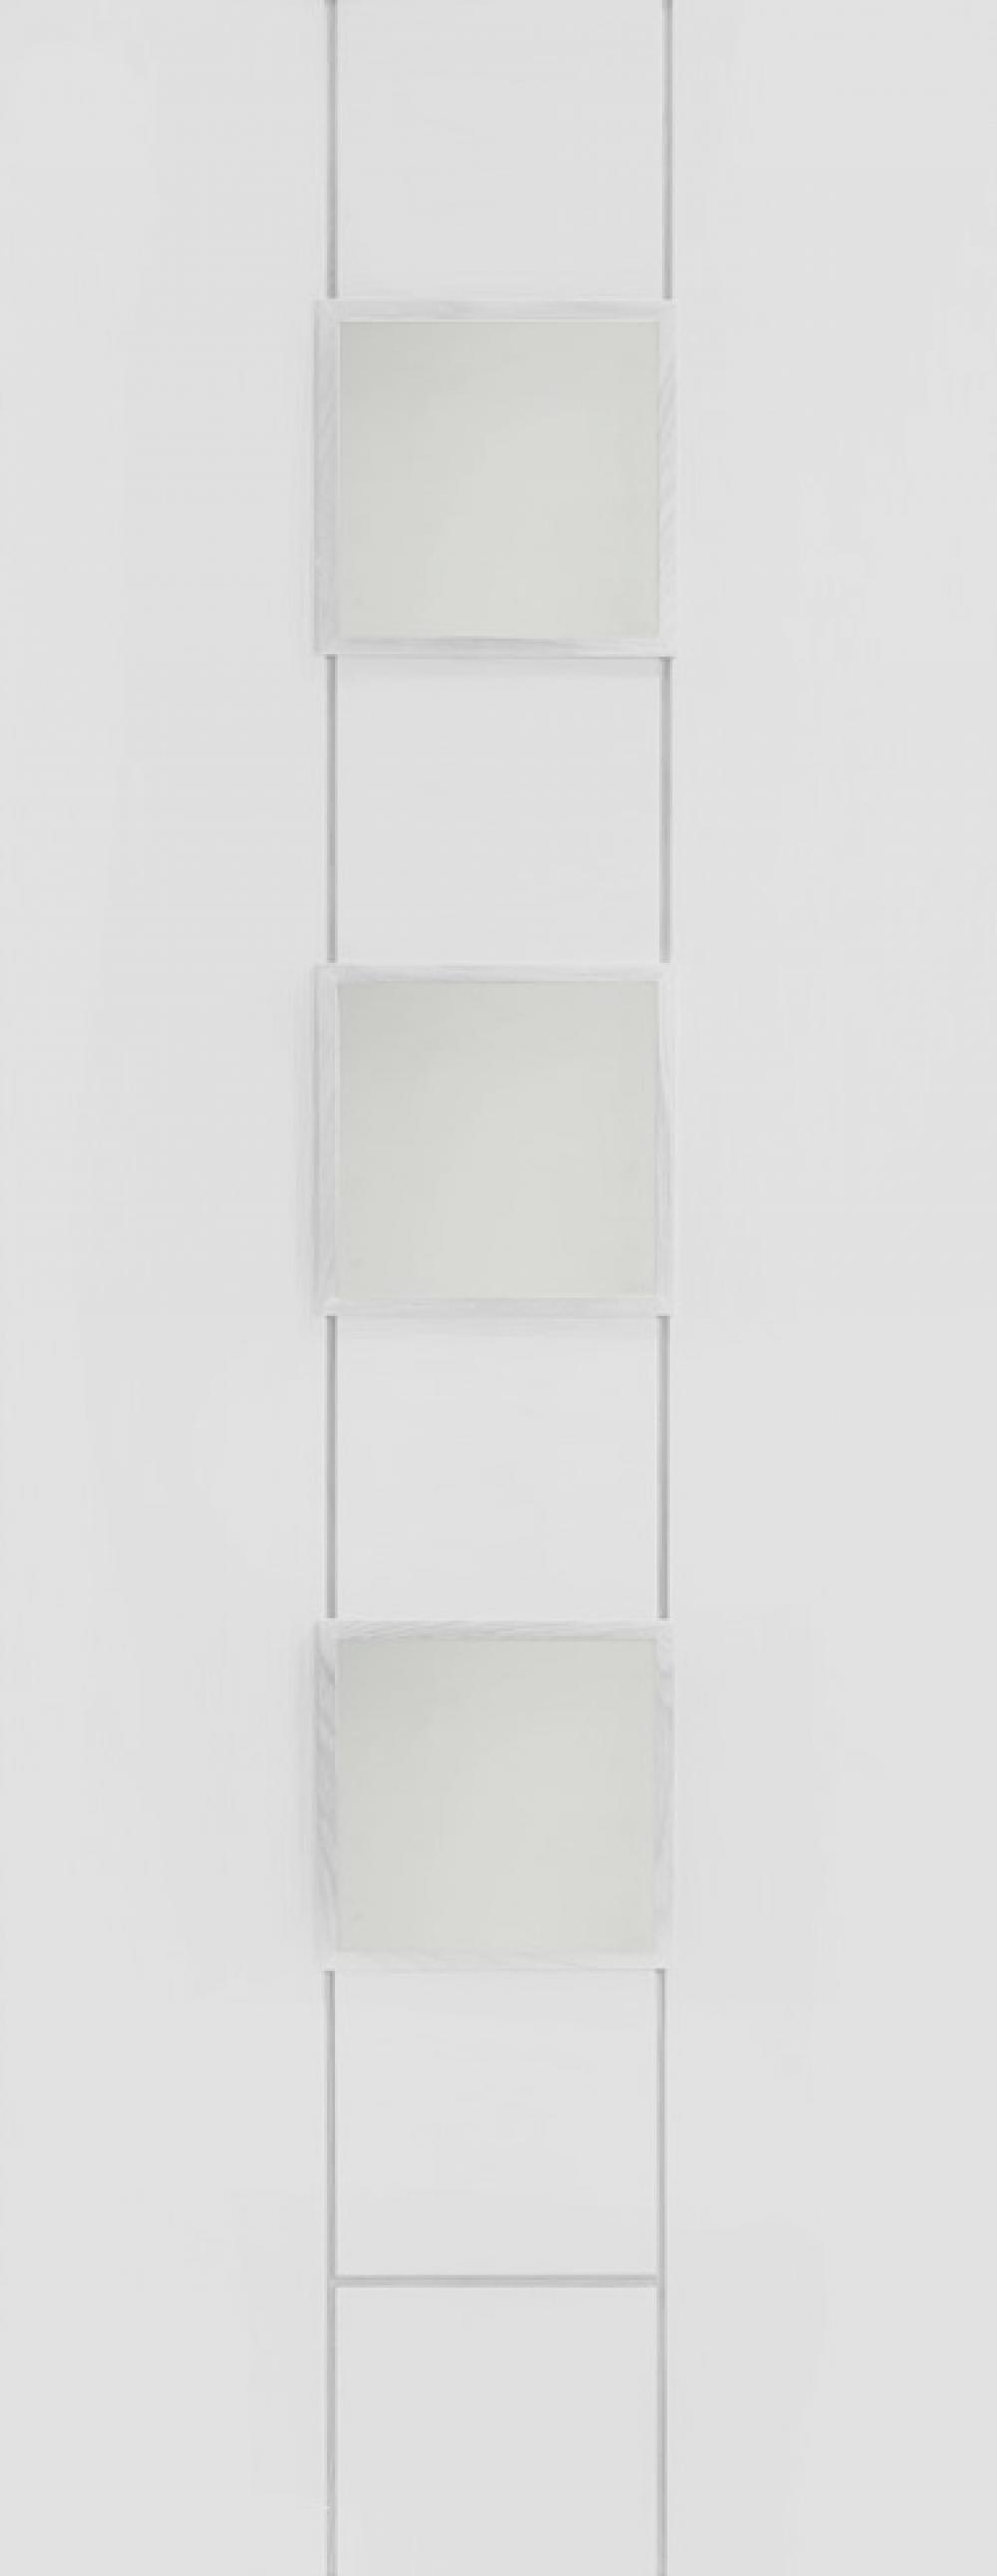 Messina White Glazed Door